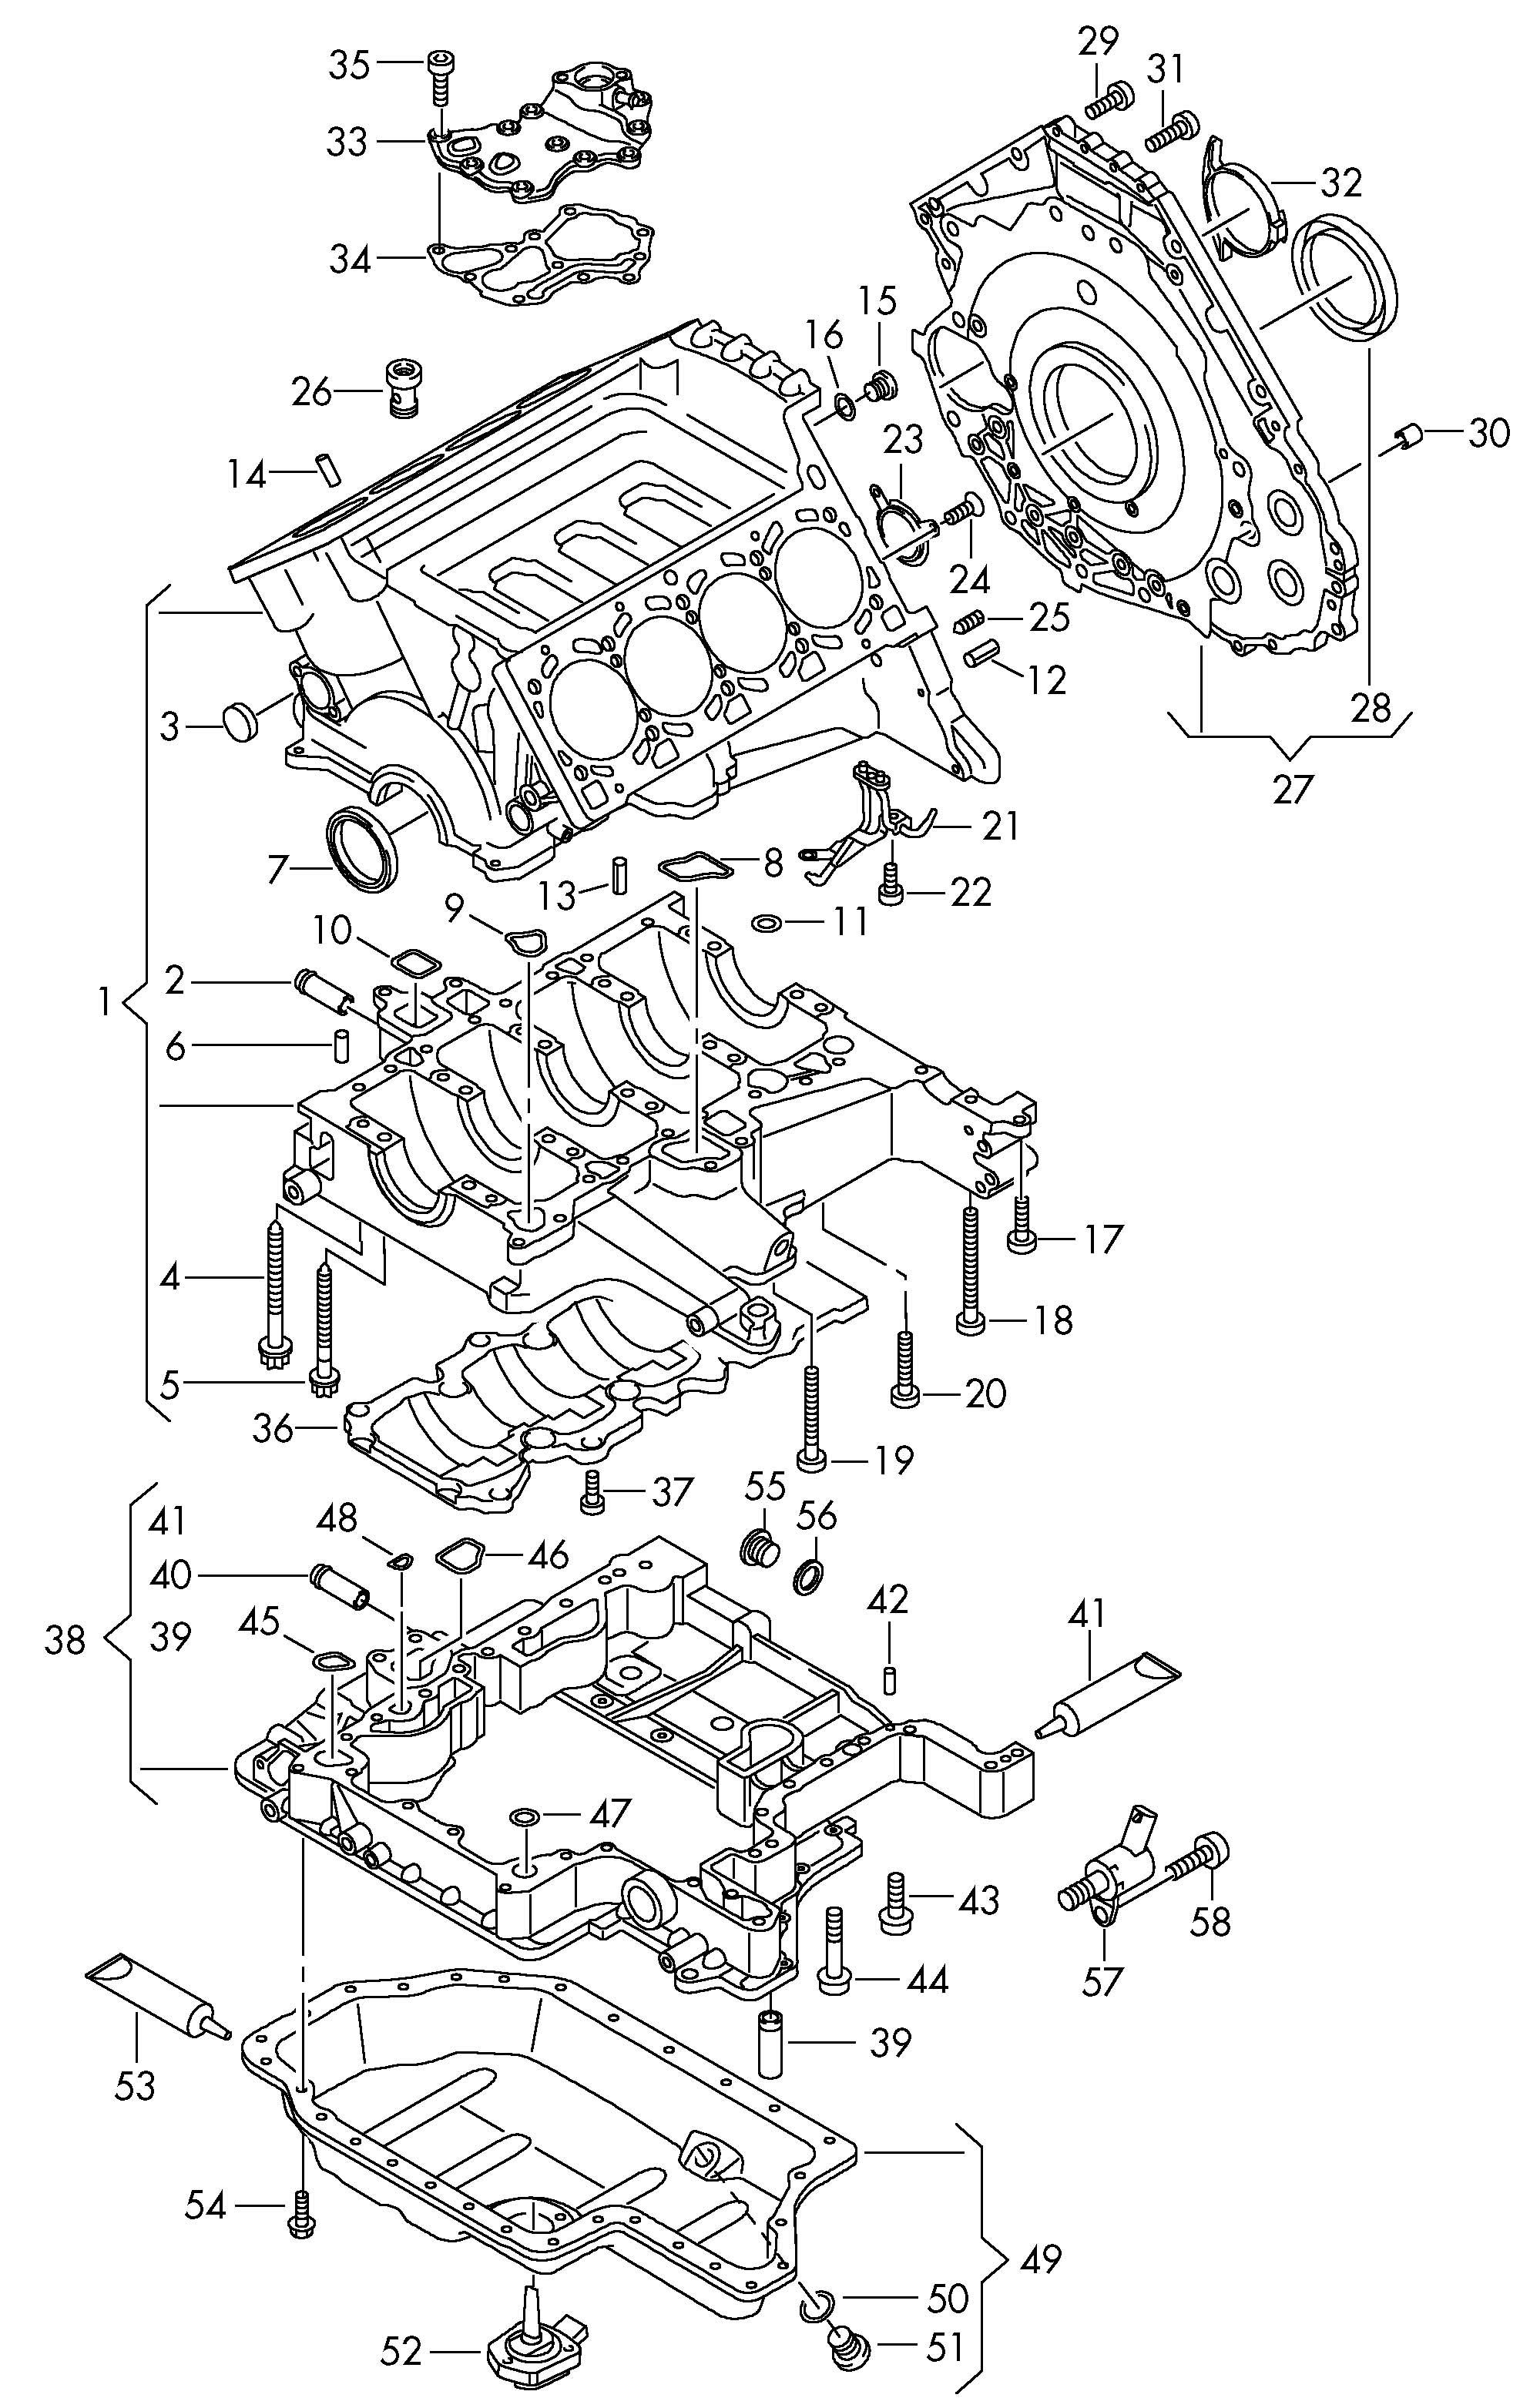 Volkswagen Jetta Seal Ring Sealing Washer